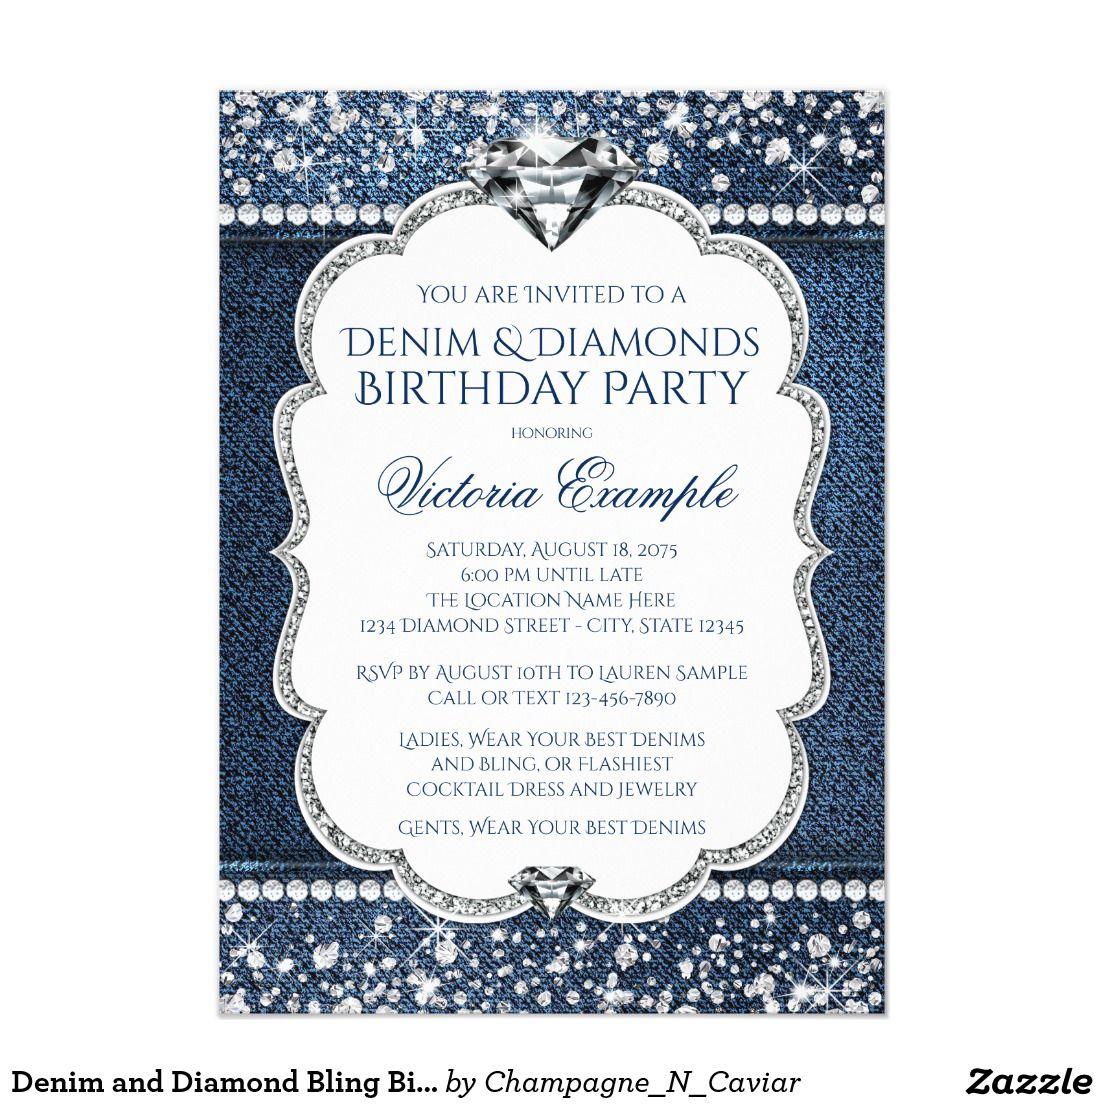 Denim and Diamond Bling Birthday Party Invitations   Birthday ...